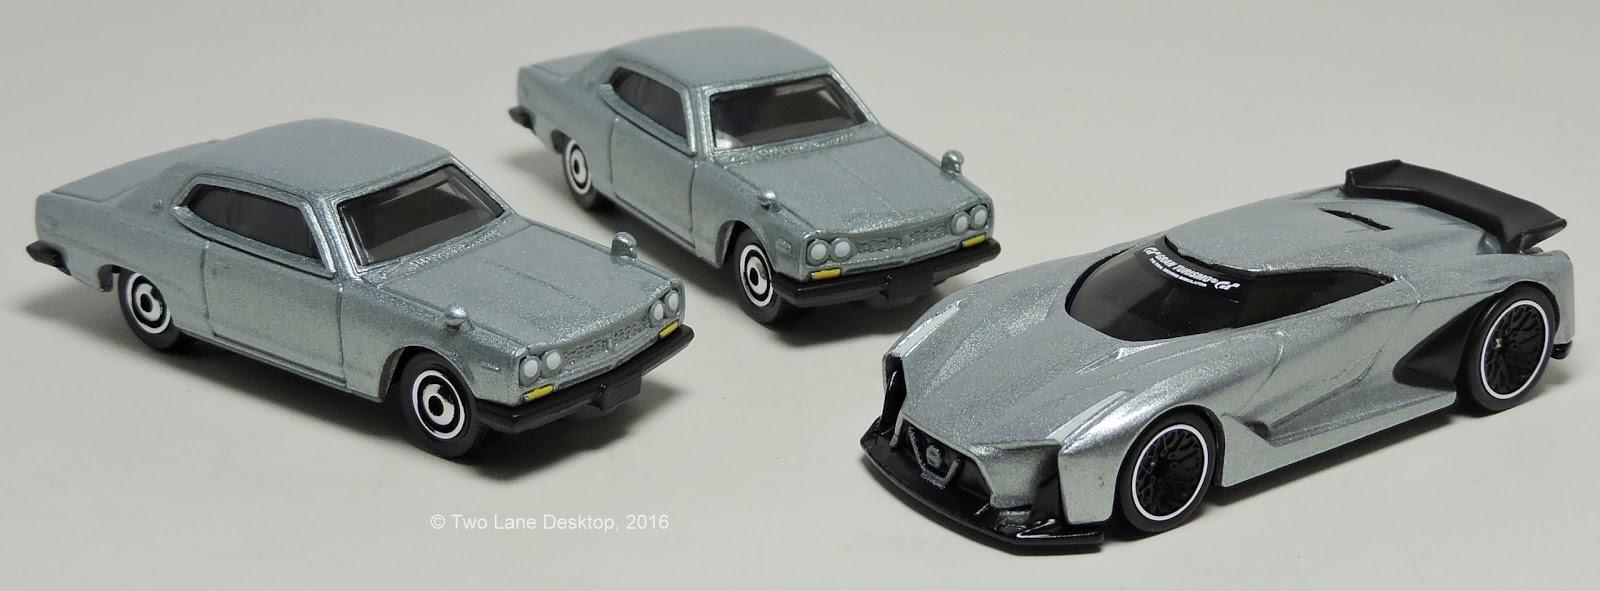 Two Lane Desktop: Matchbox 1971 Nissan Skyline 2000GTX and ...